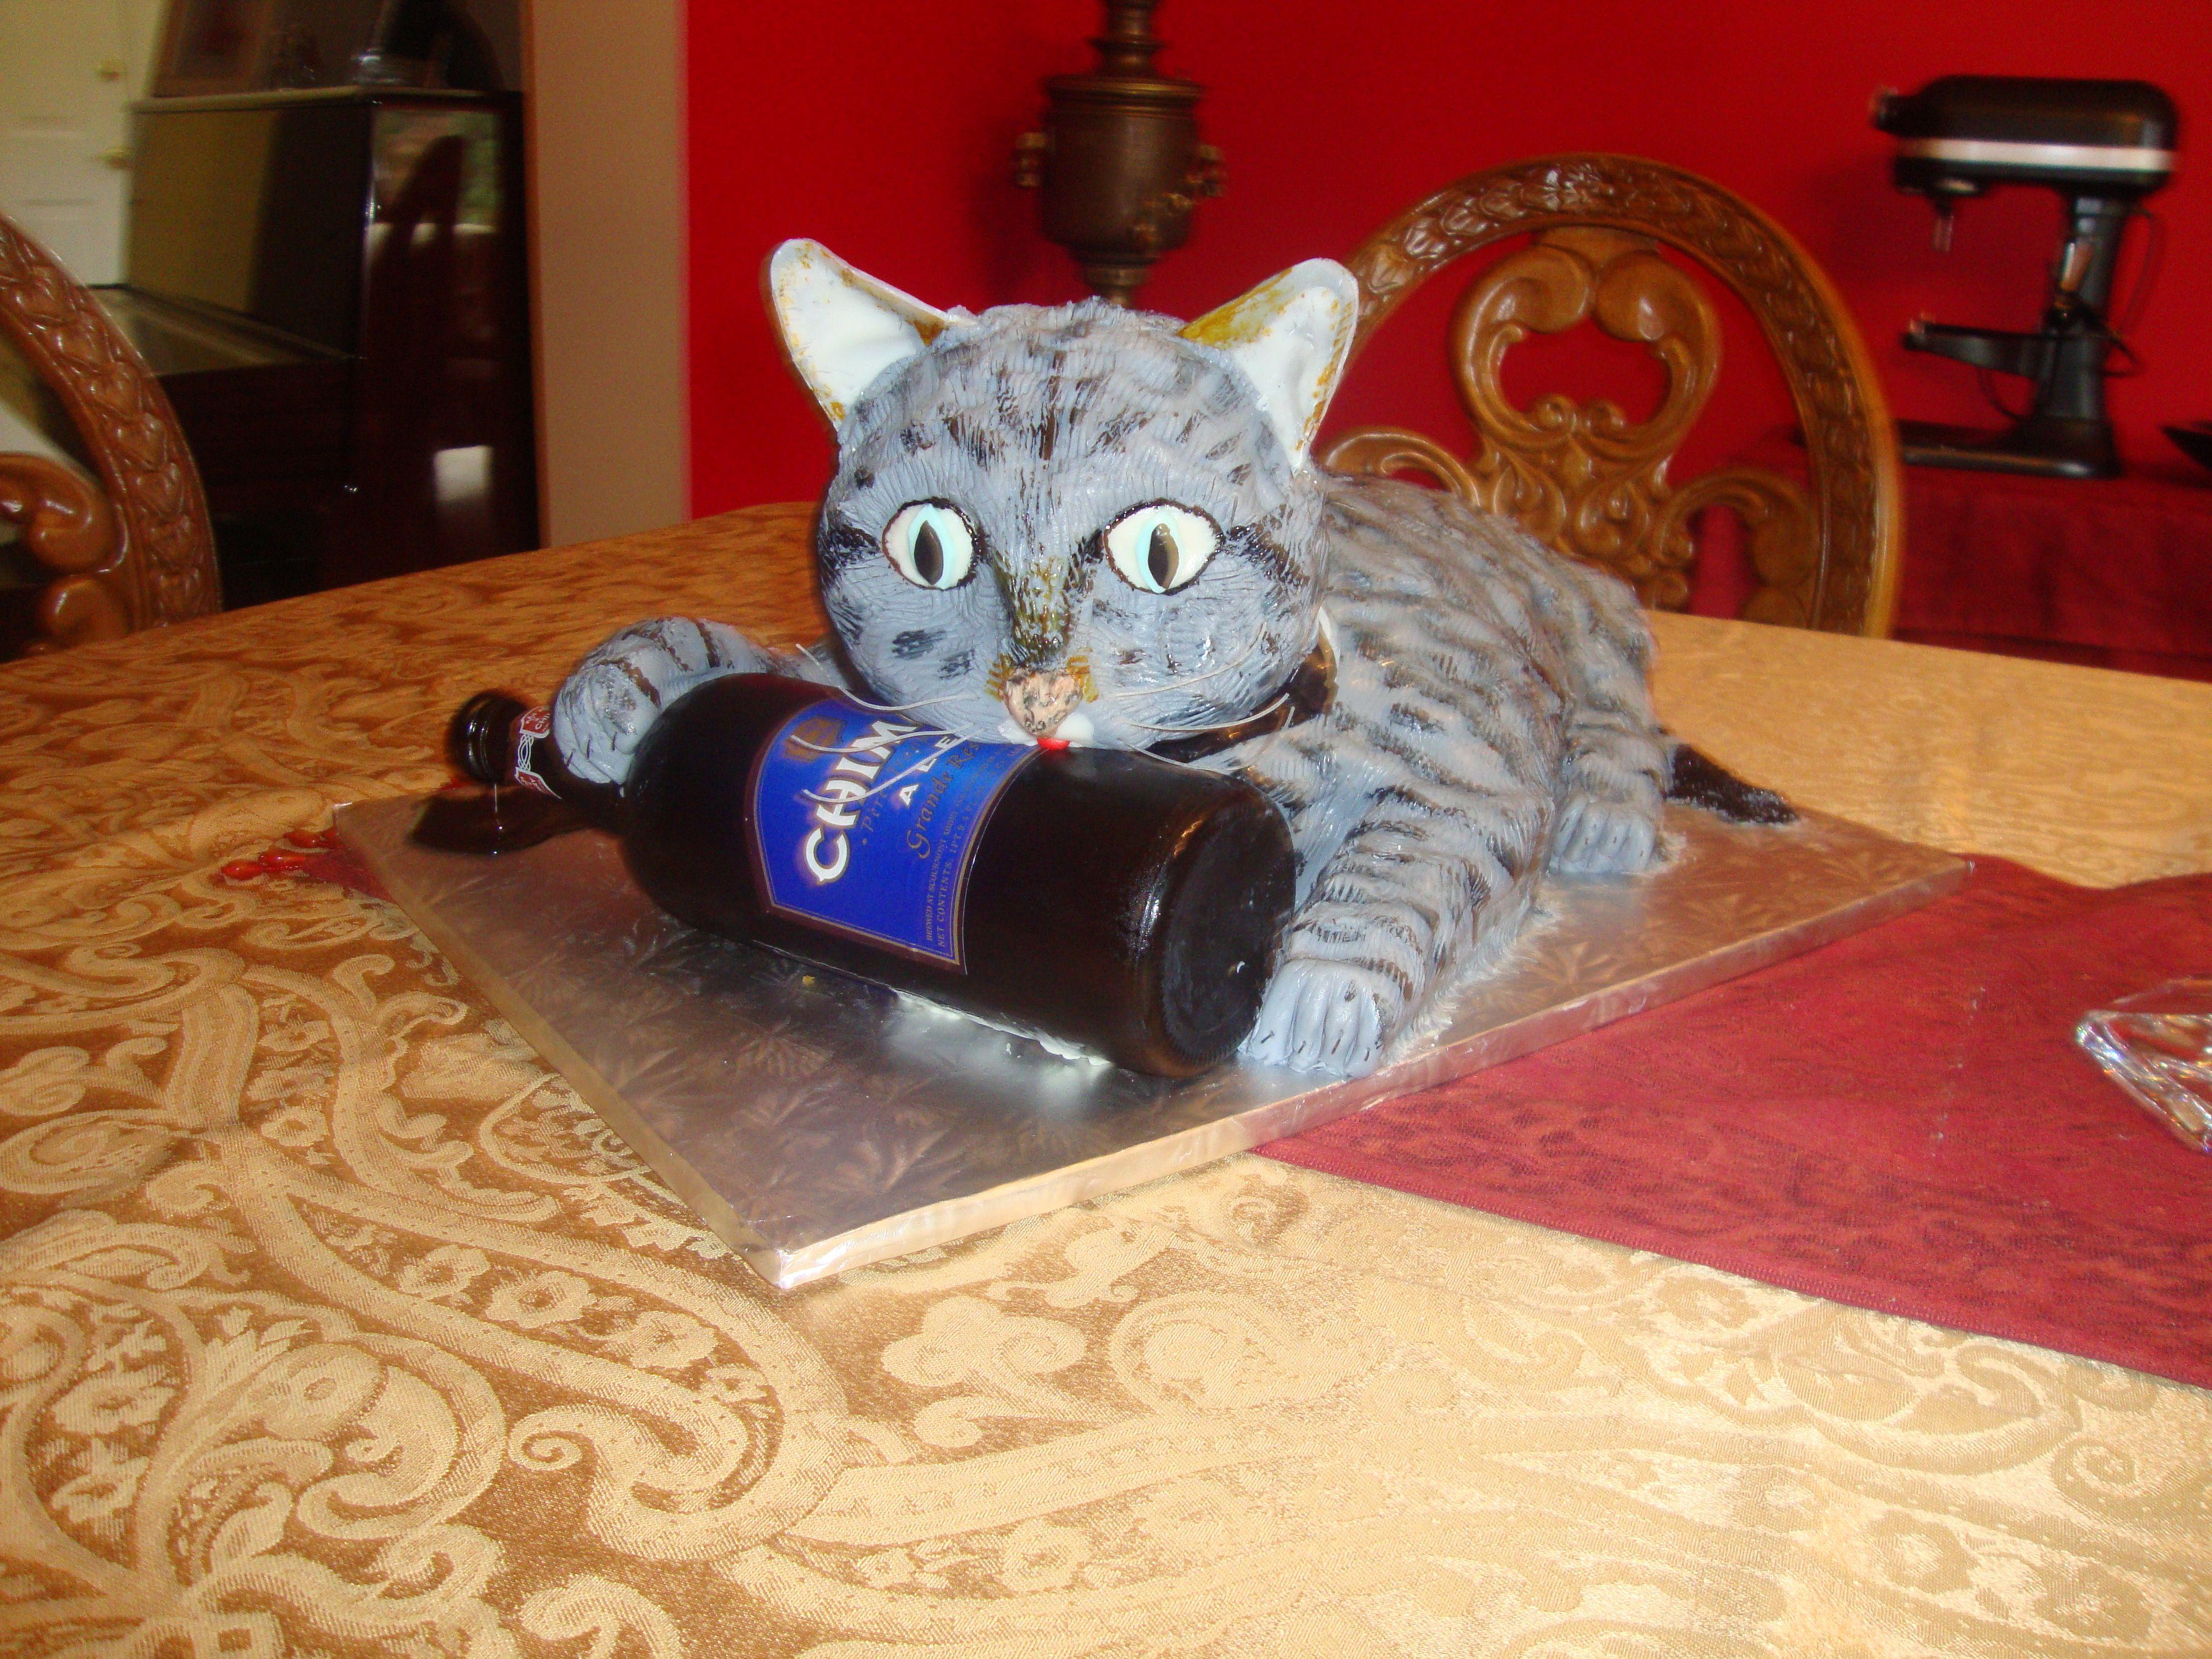 cat beer bottle animal - photo #19